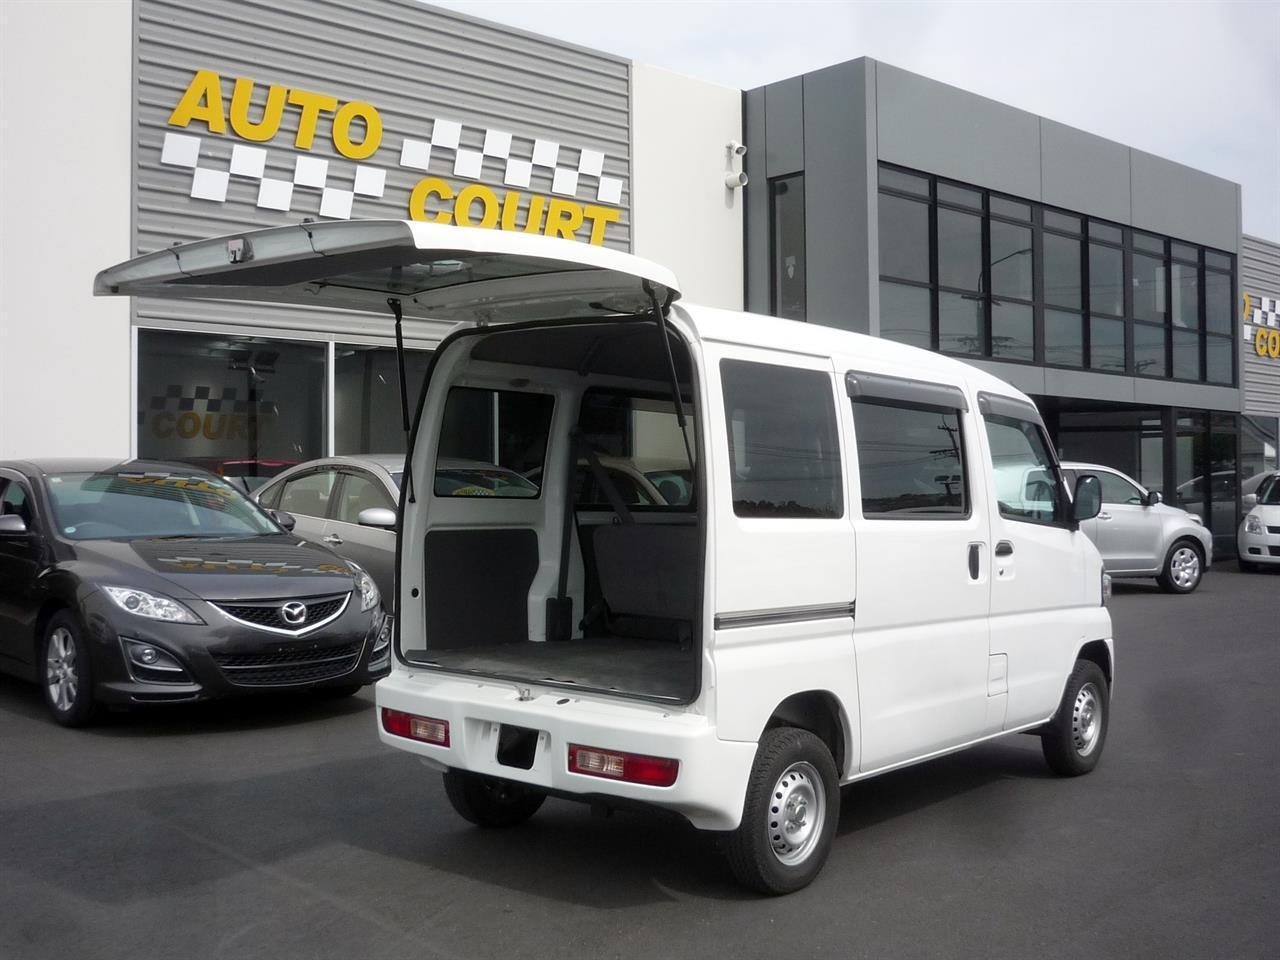 image-11, 2013 Mitsubishi MiniCab MiEV Electric Van at Dunedin